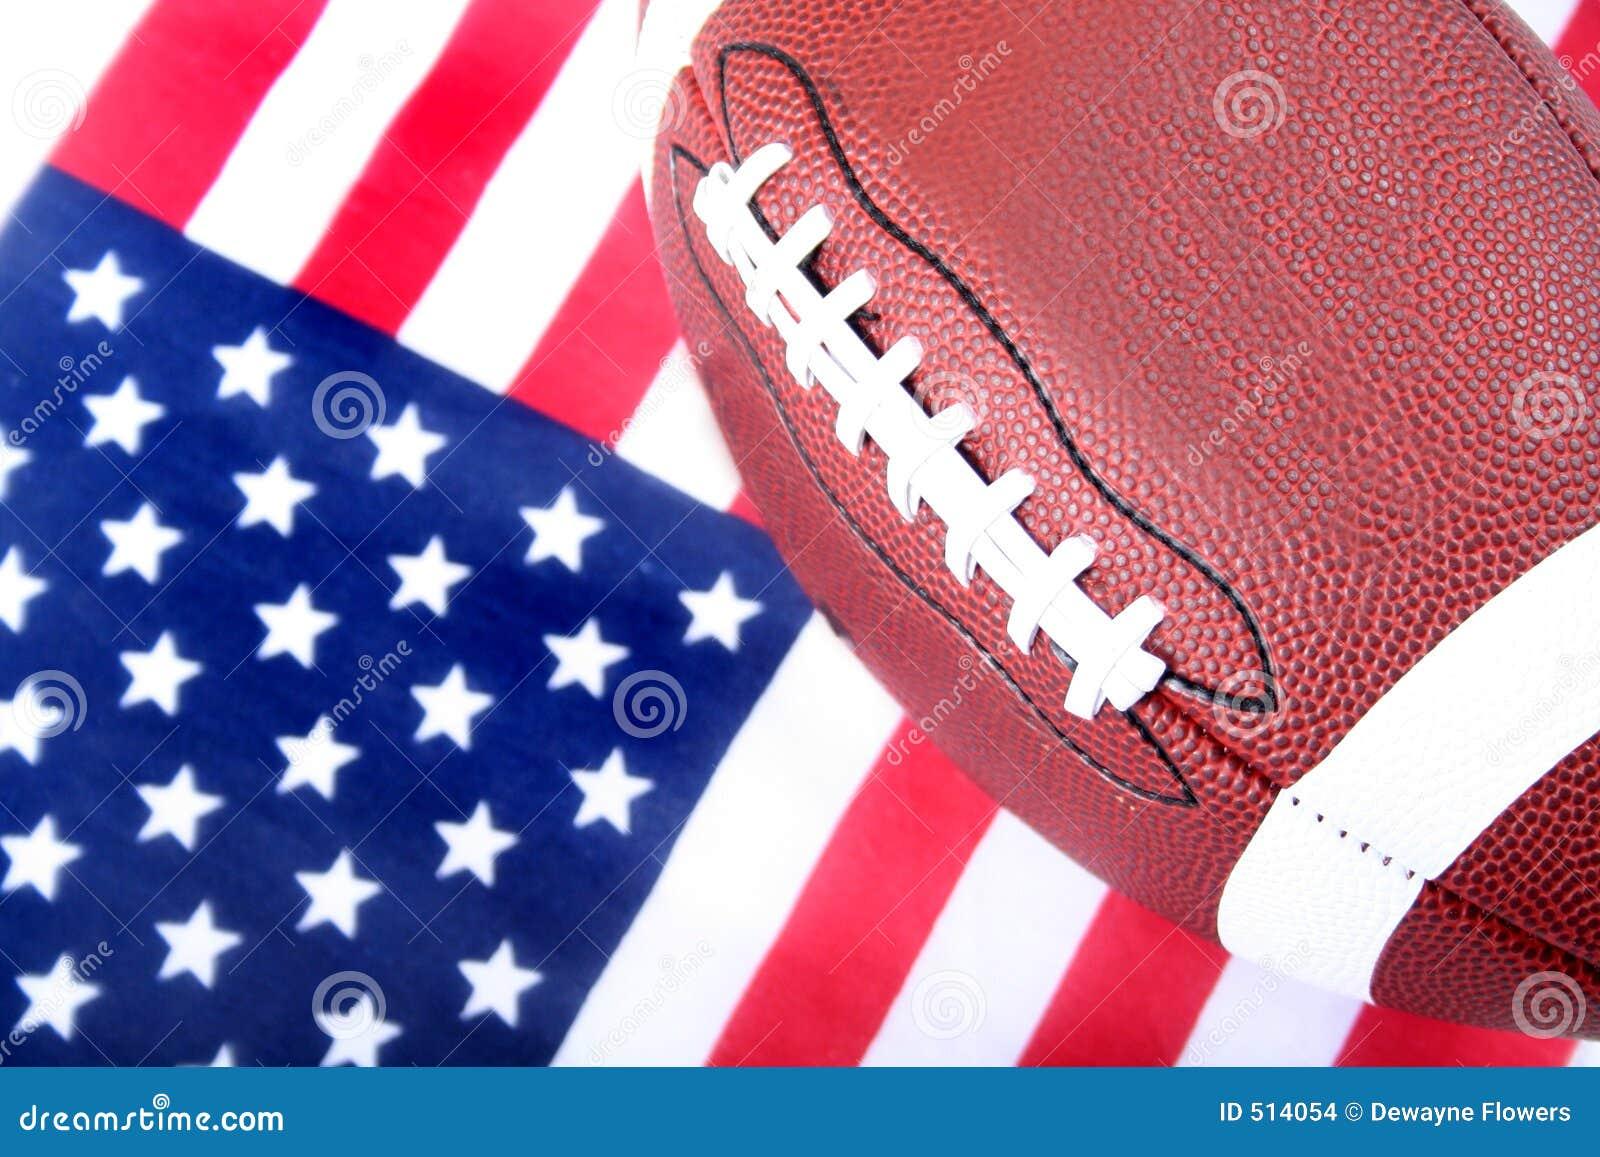 American Flag And Football Stock Photo Image Of Ball